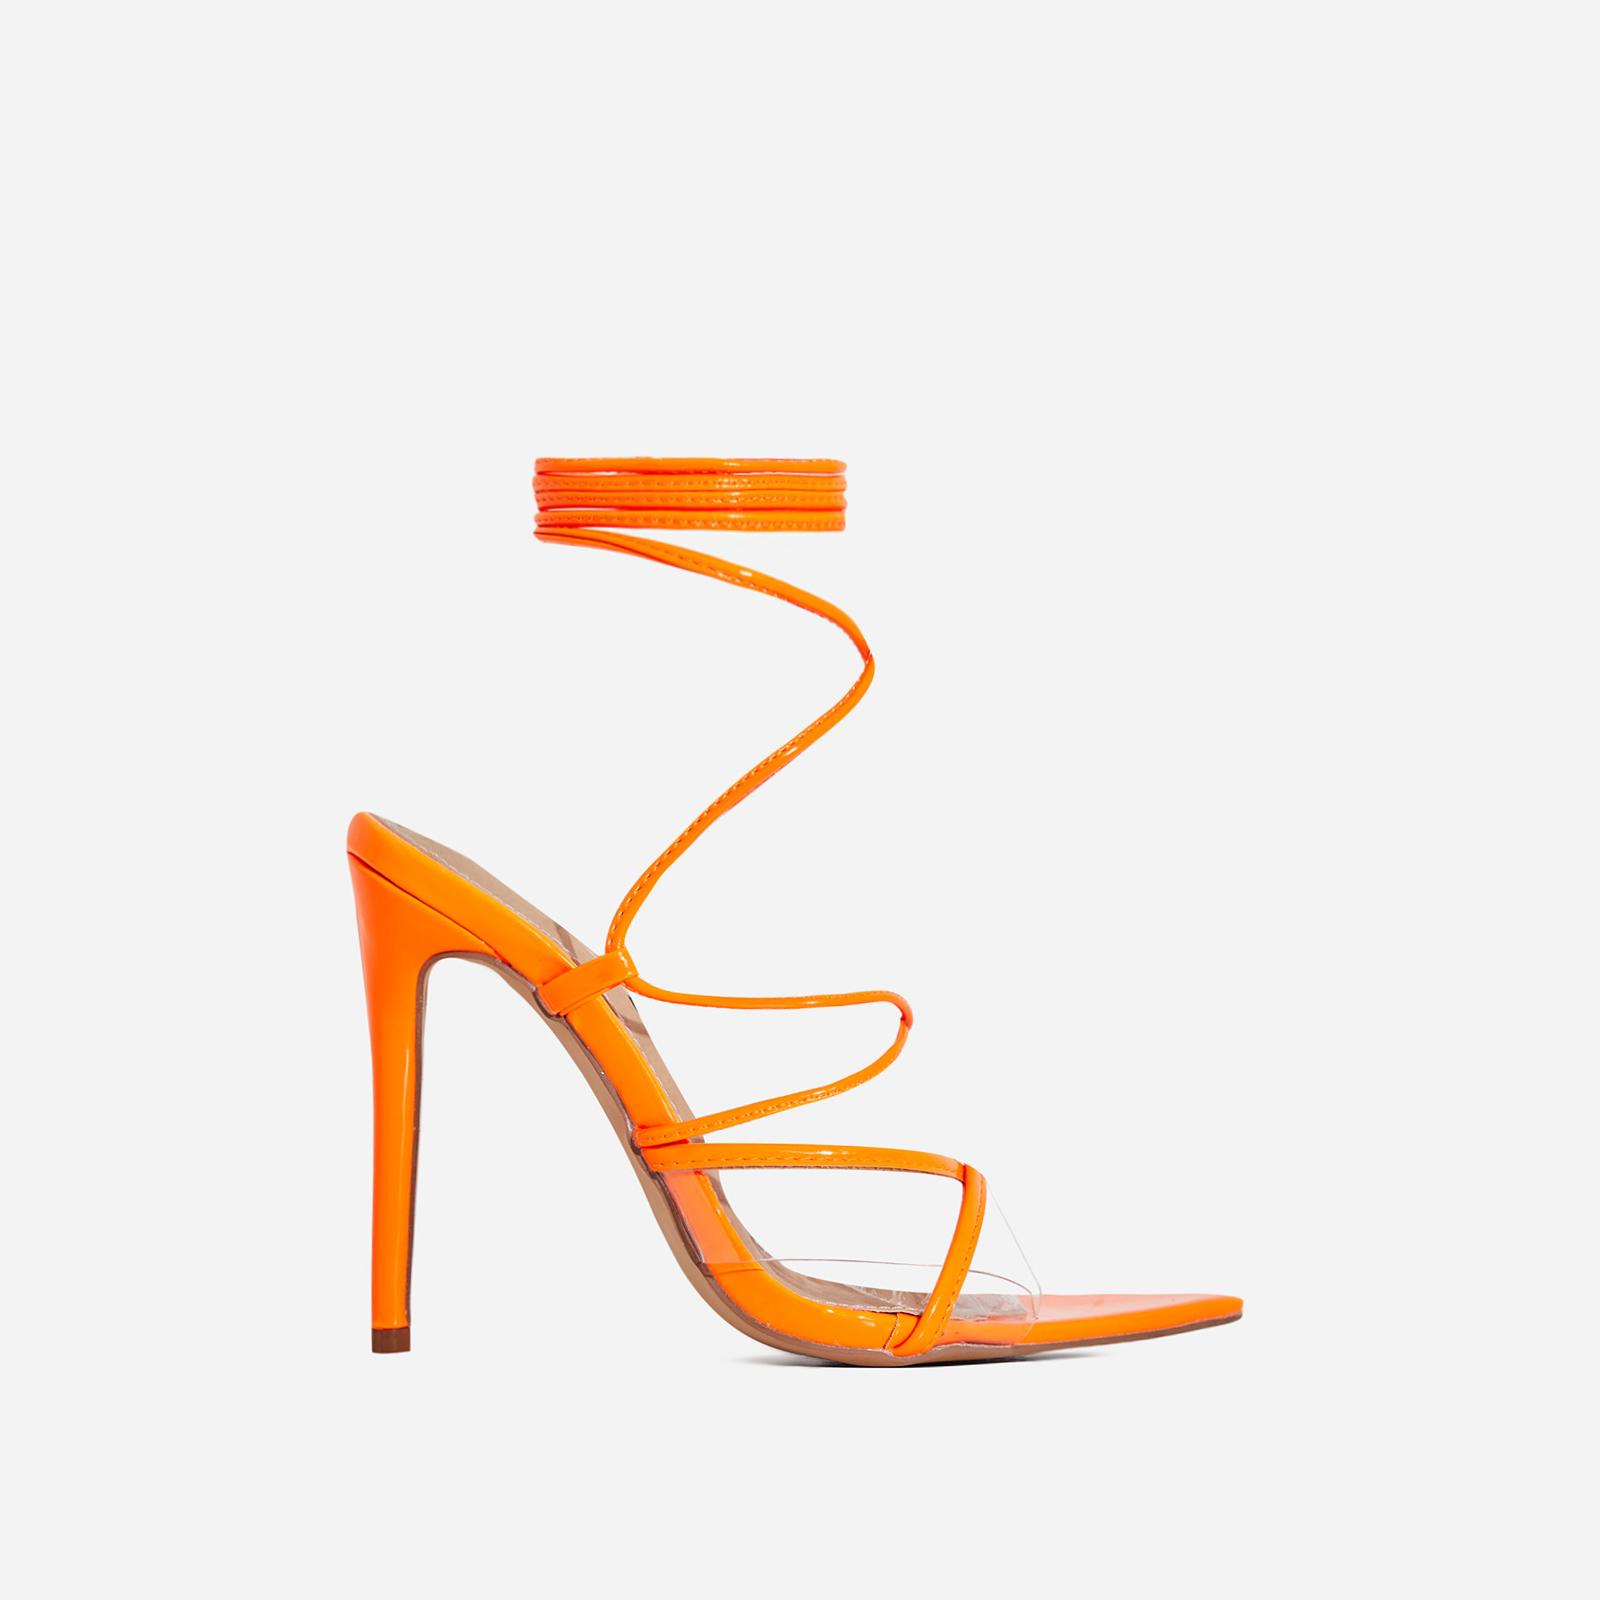 Ava Perspex Lace Up Heel In Neon Orange Patent